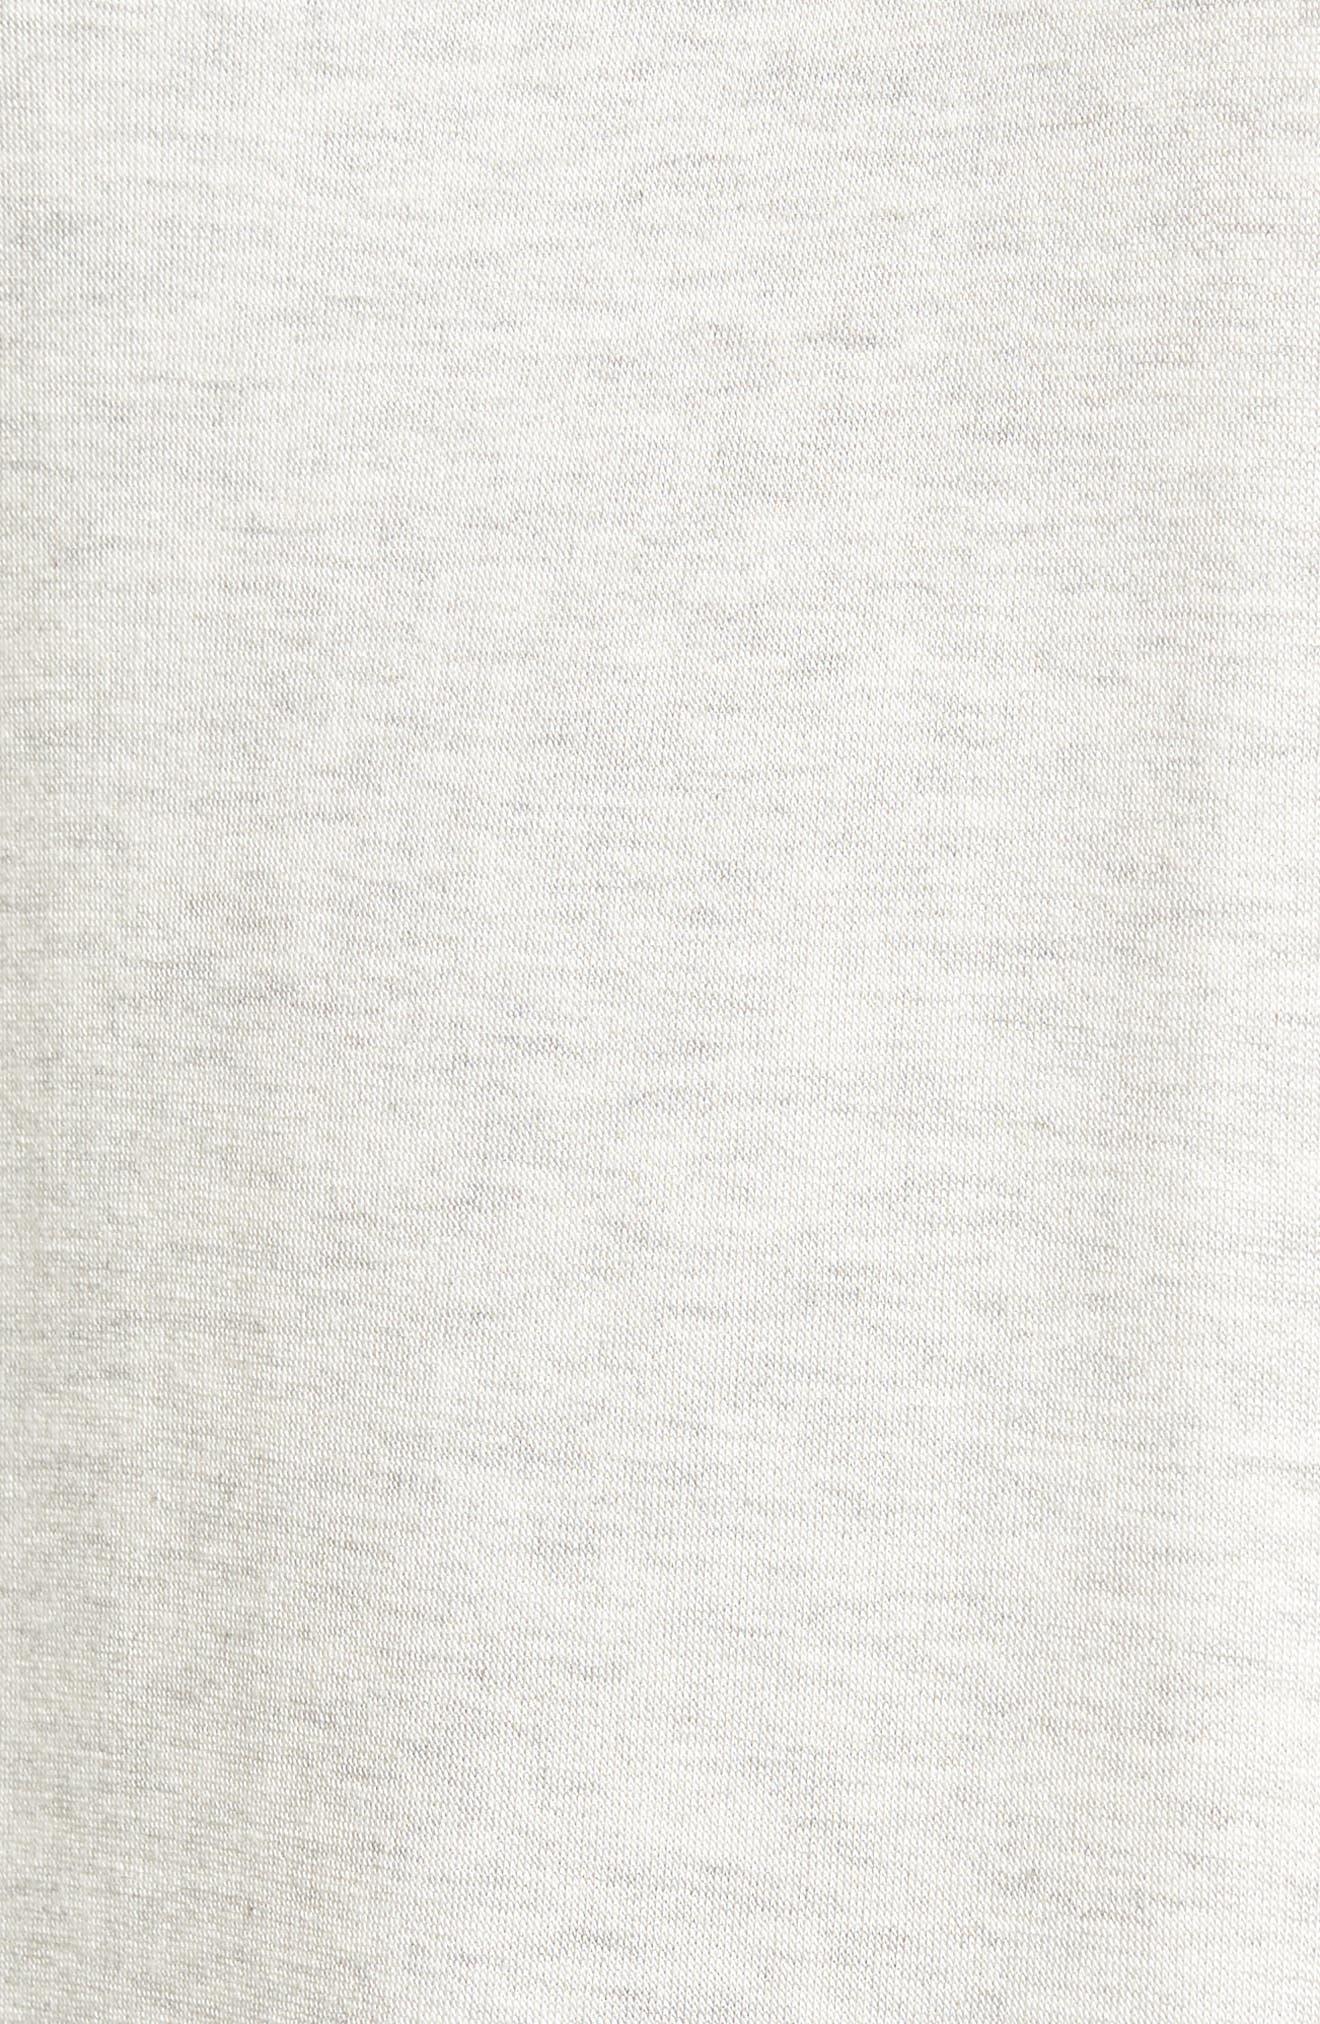 Snake Print Sweatshirt,                             Alternate thumbnail 5, color,                             Light Grey